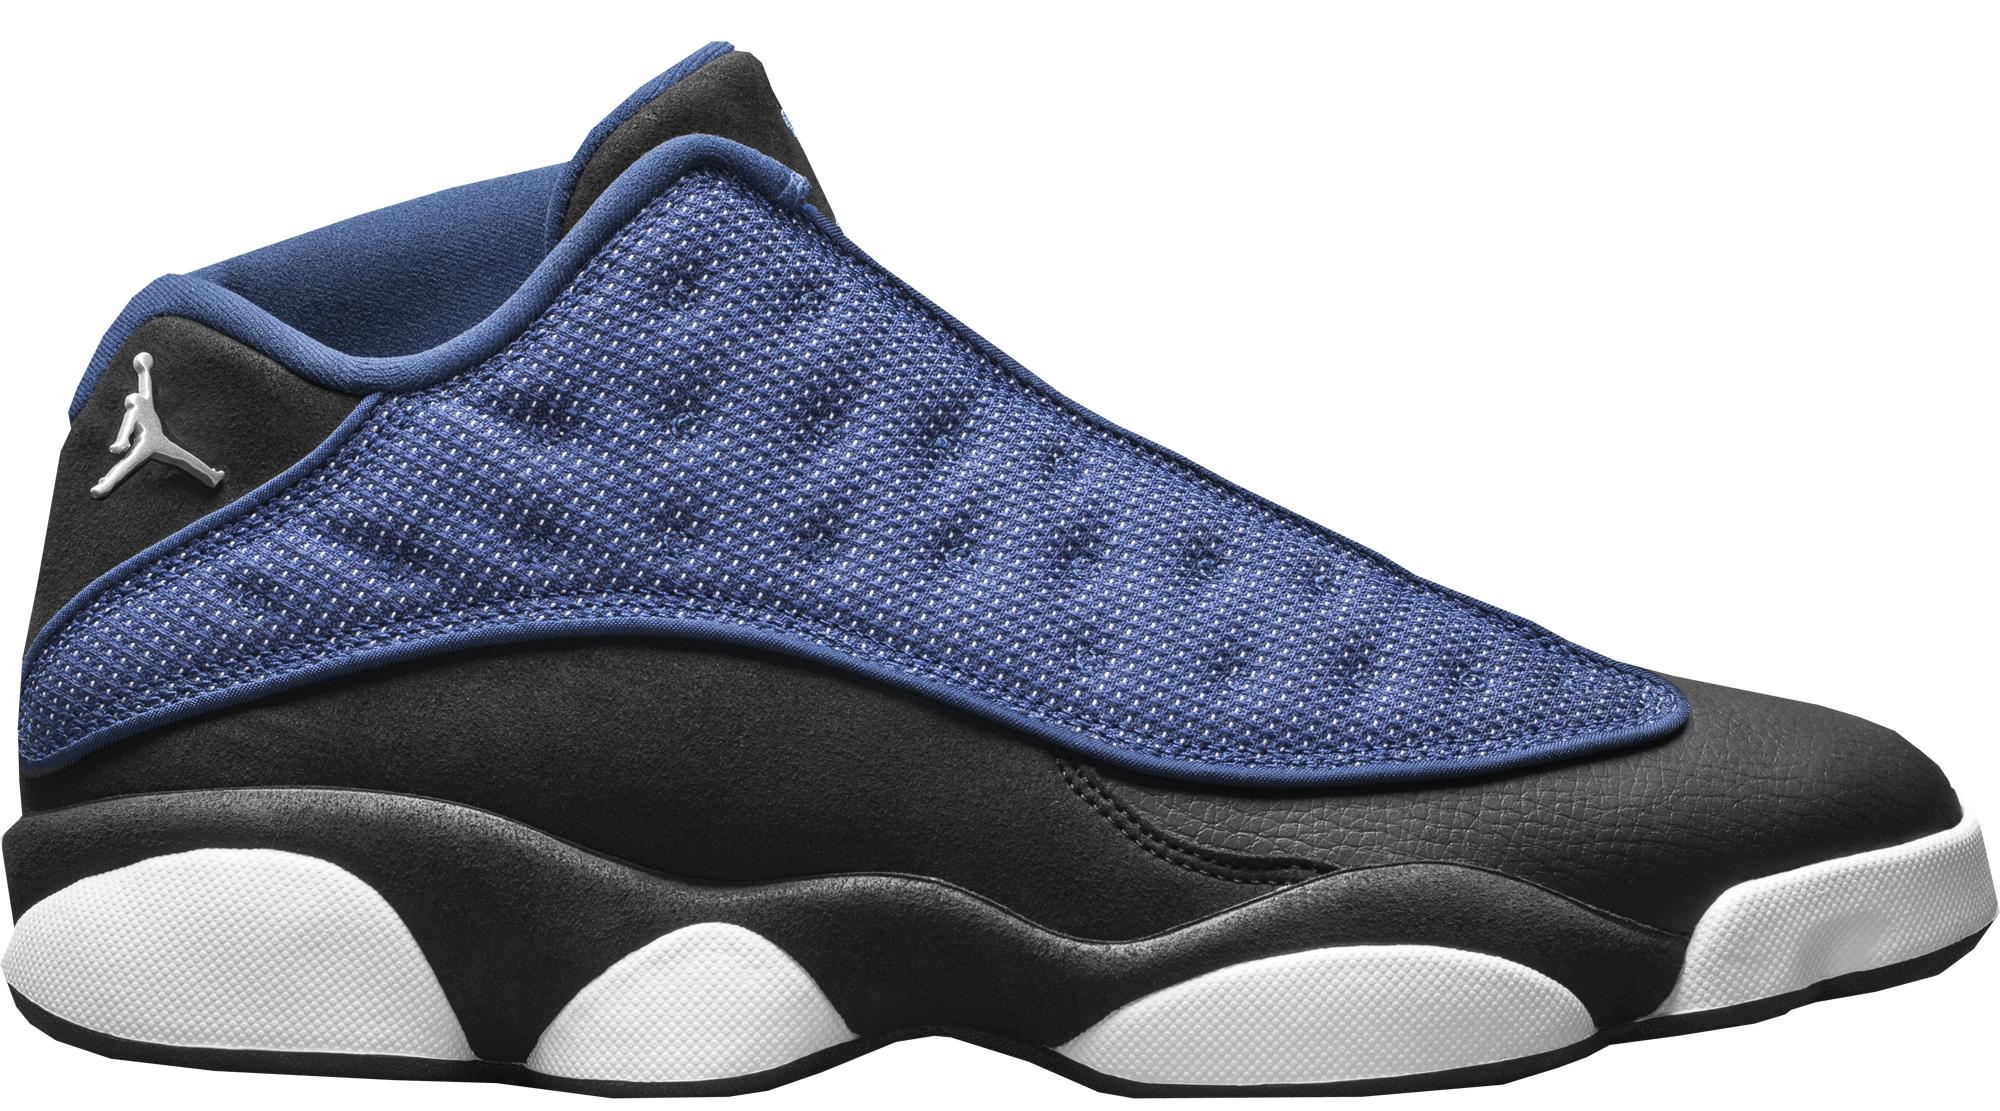 Jordan 13 Retro Low Brave Blue